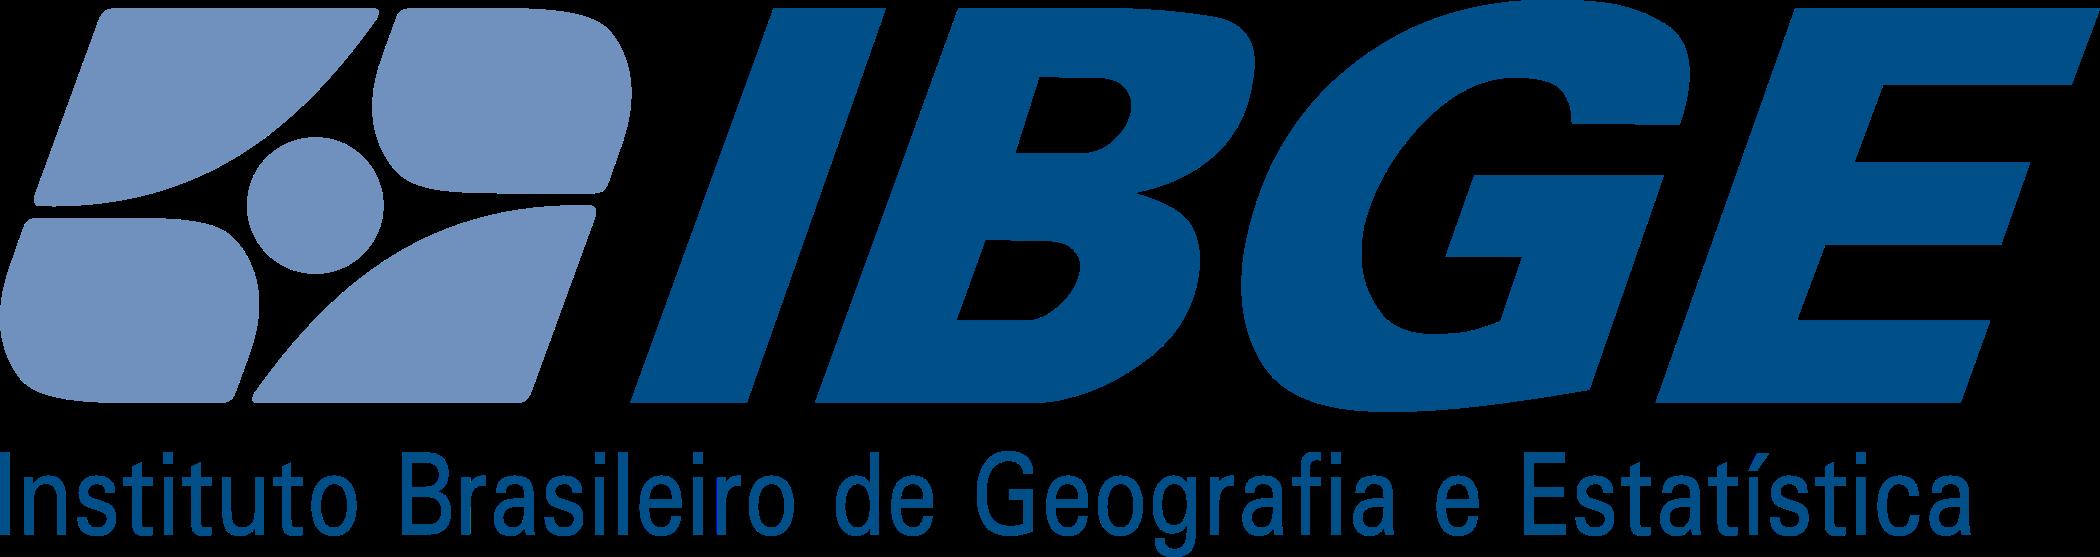 ibge logo 1 - IBGE Logo